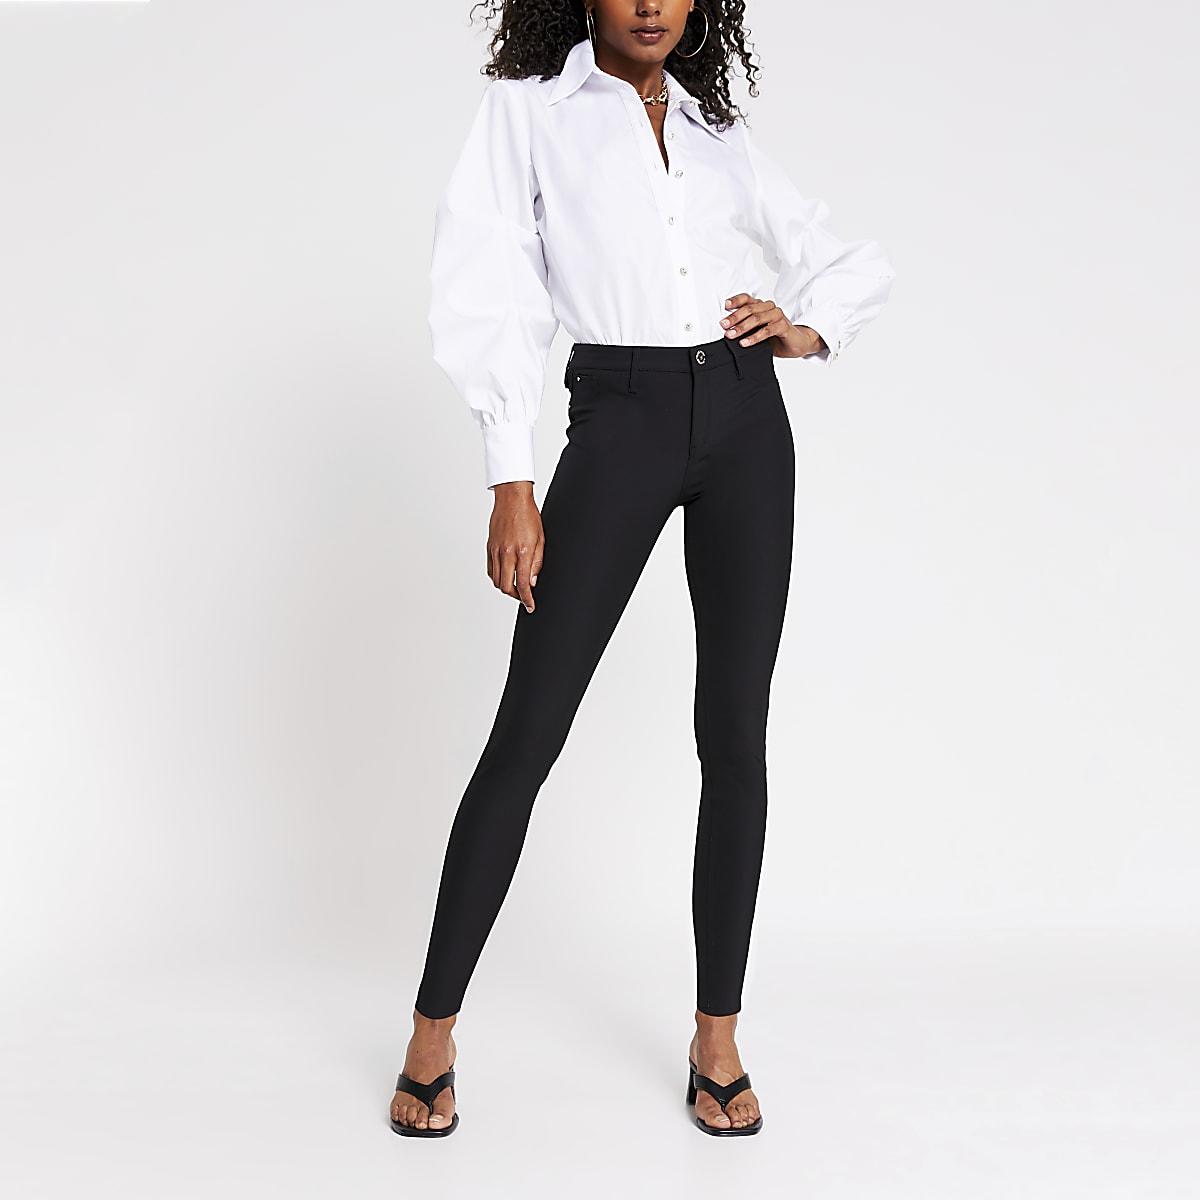 276c6eaeb2b7 Black Molly skinny fit trousers - Skinny Trousers - Trousers - women